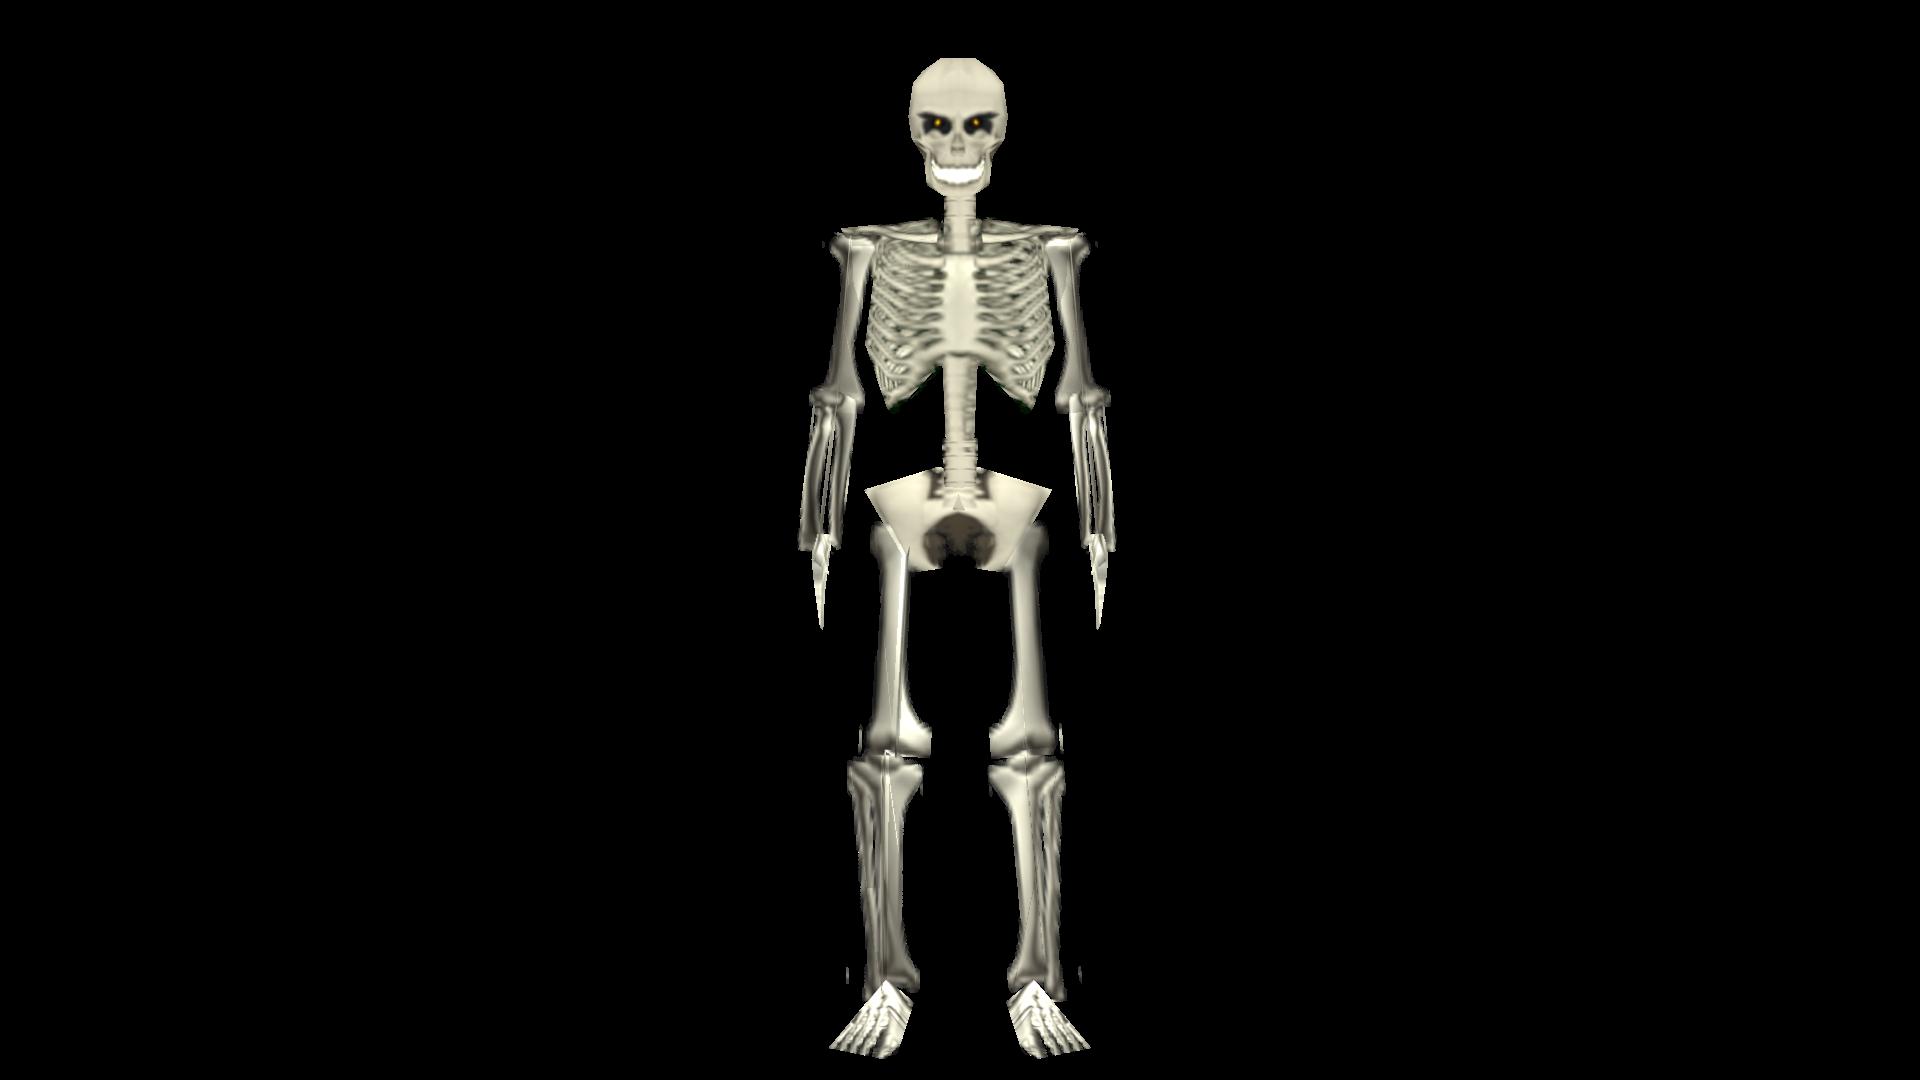 Skeleton Position 2